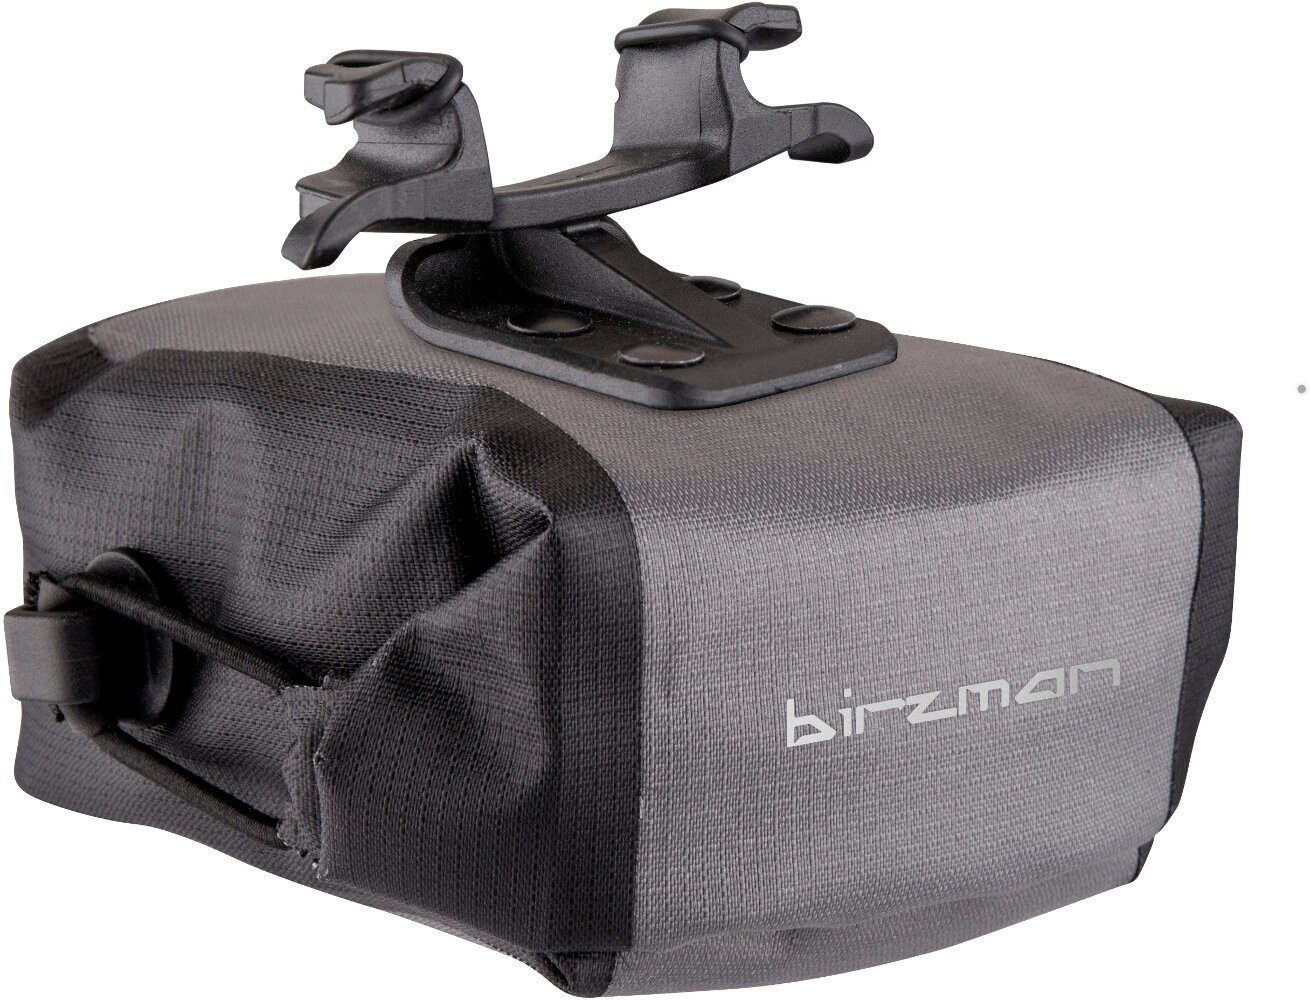 Birzman Fahrradtasche »Elements 2 Saddle Bag Big«